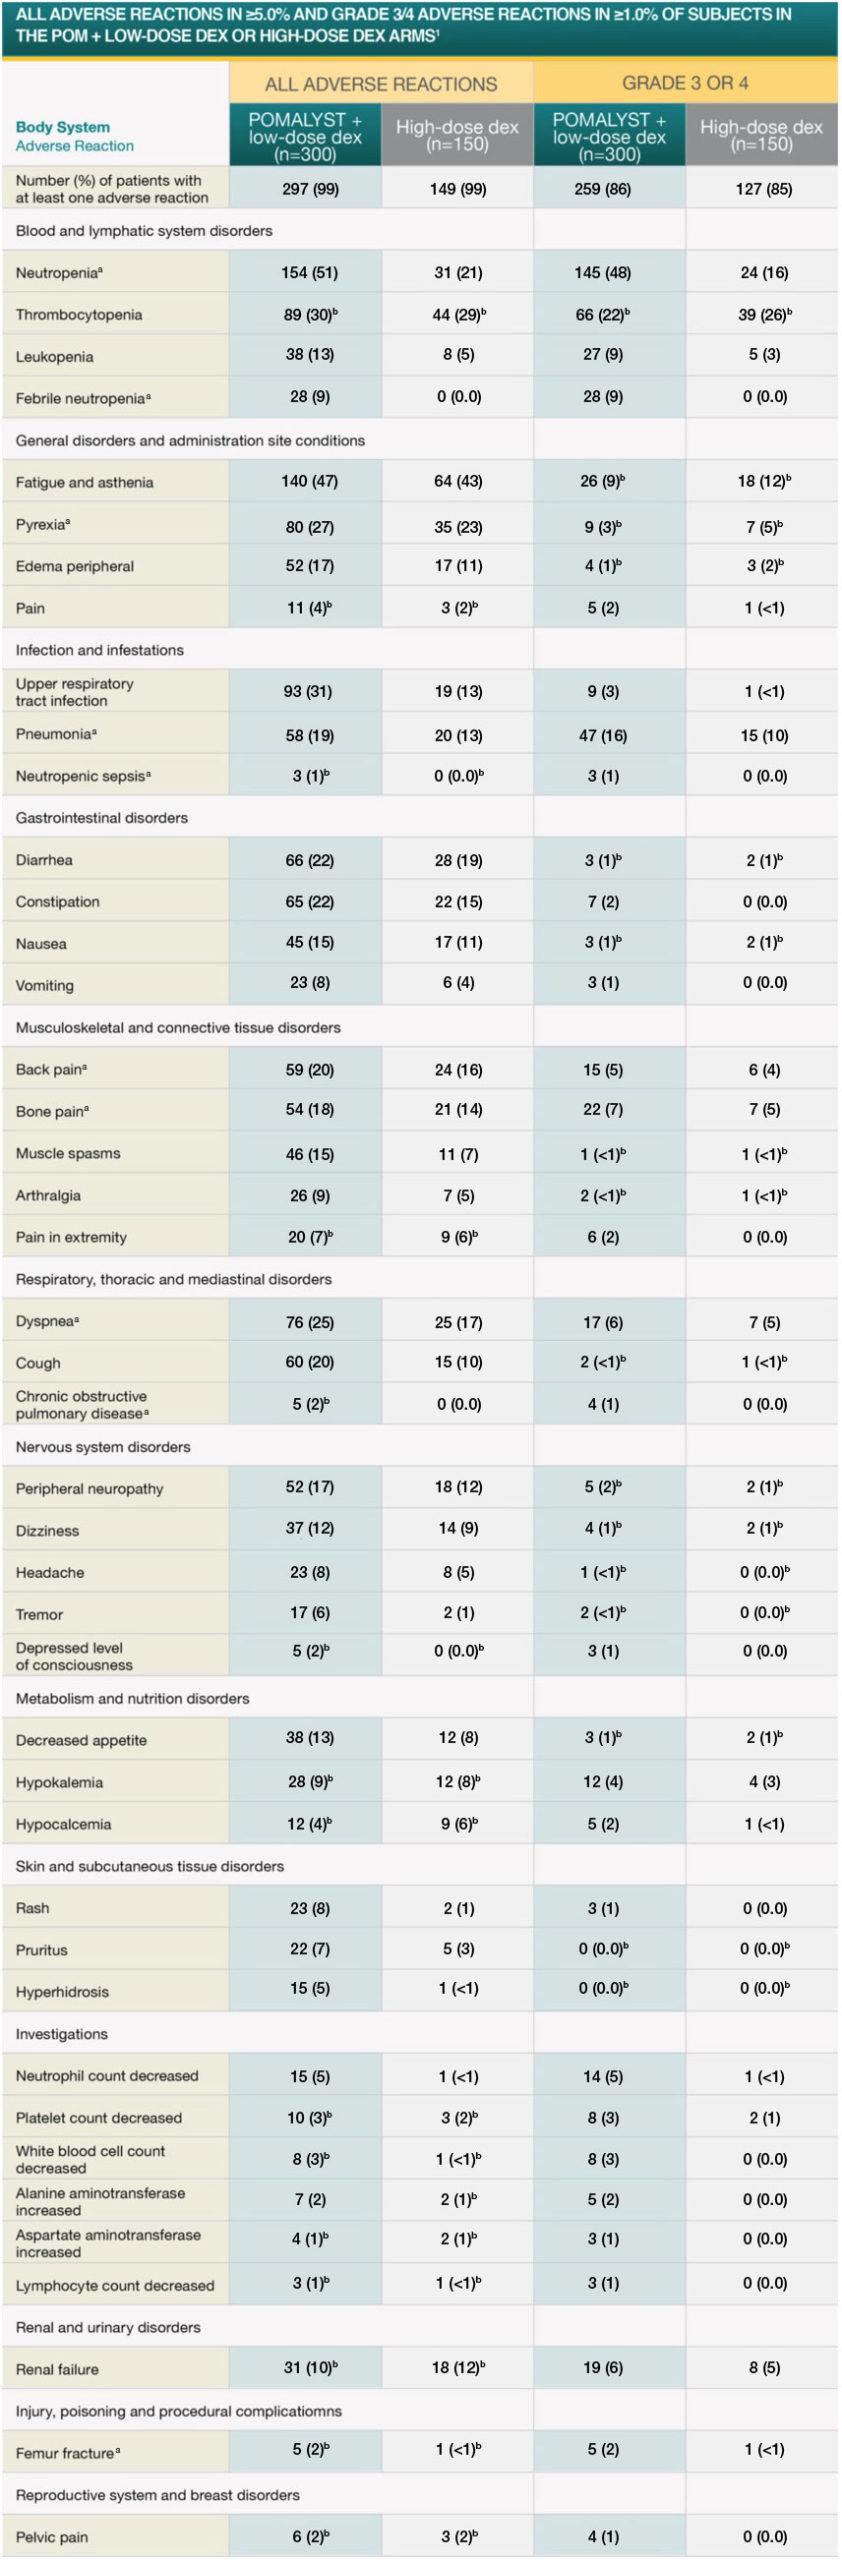 POMALYST® + dexamethasone – All Adverse Reactions table